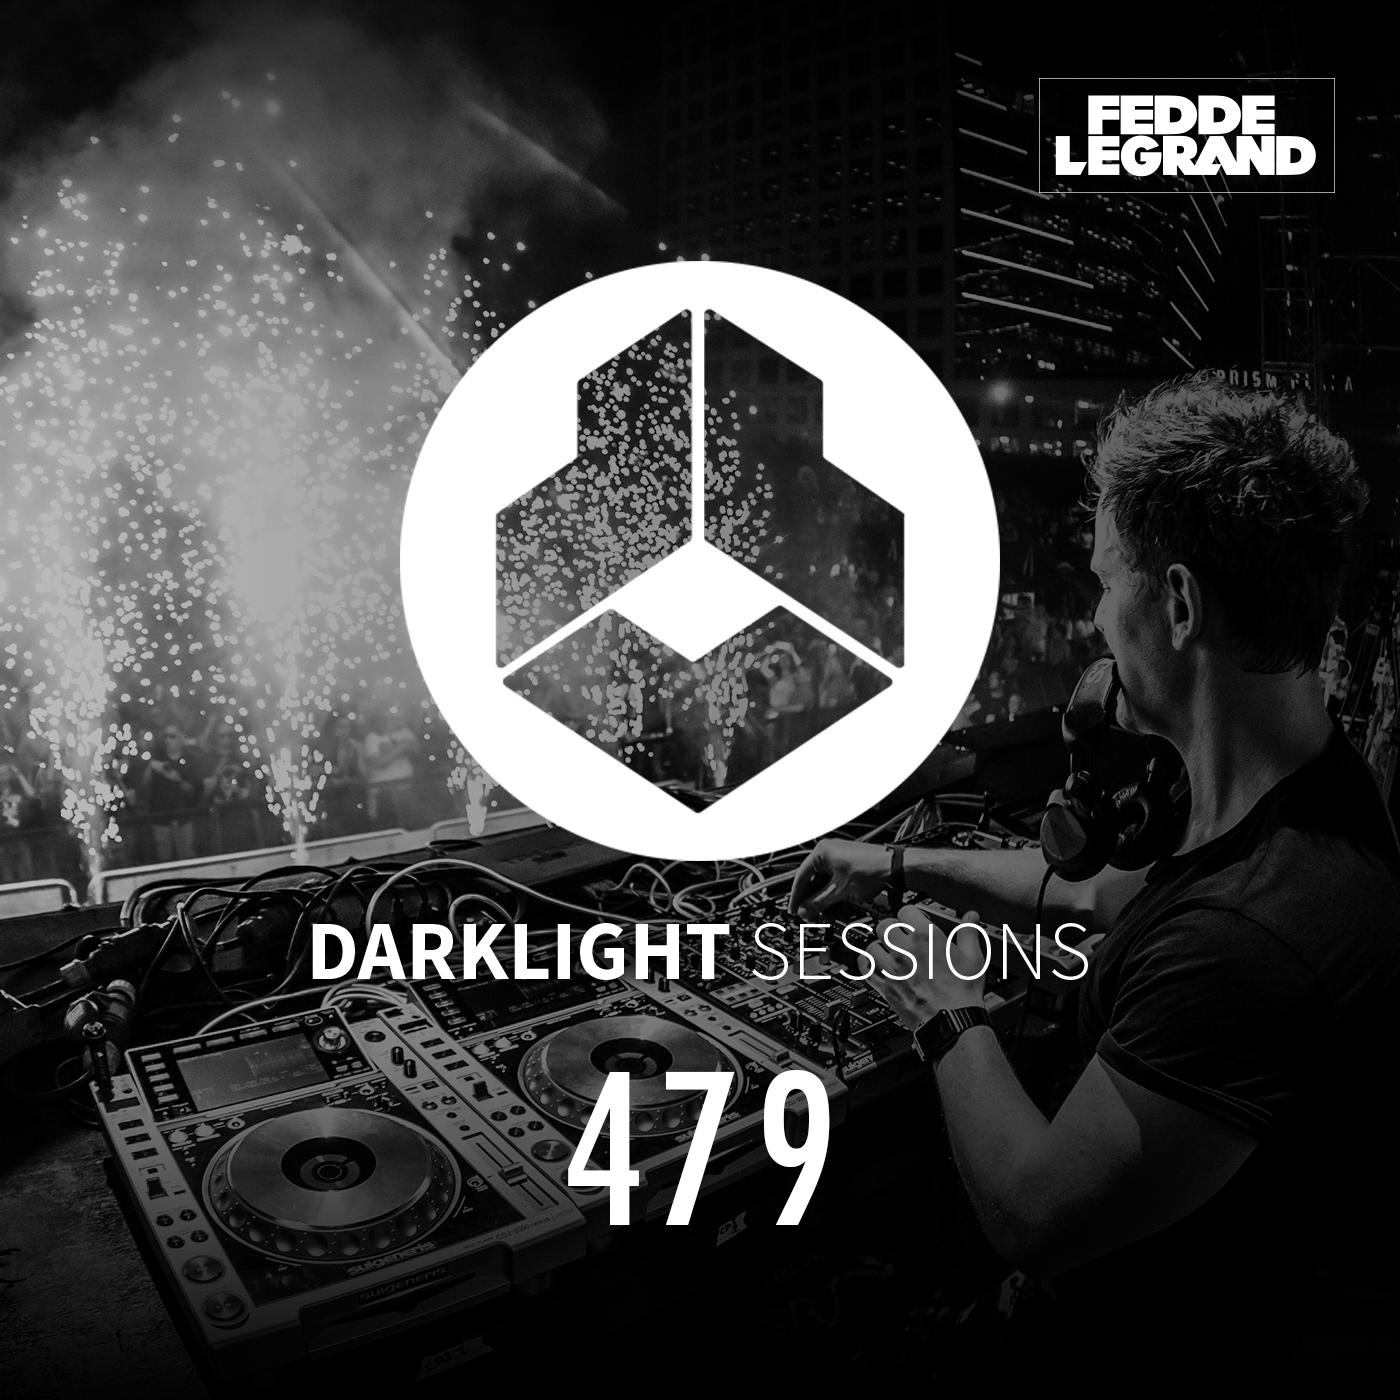 Darklight Sessions 479